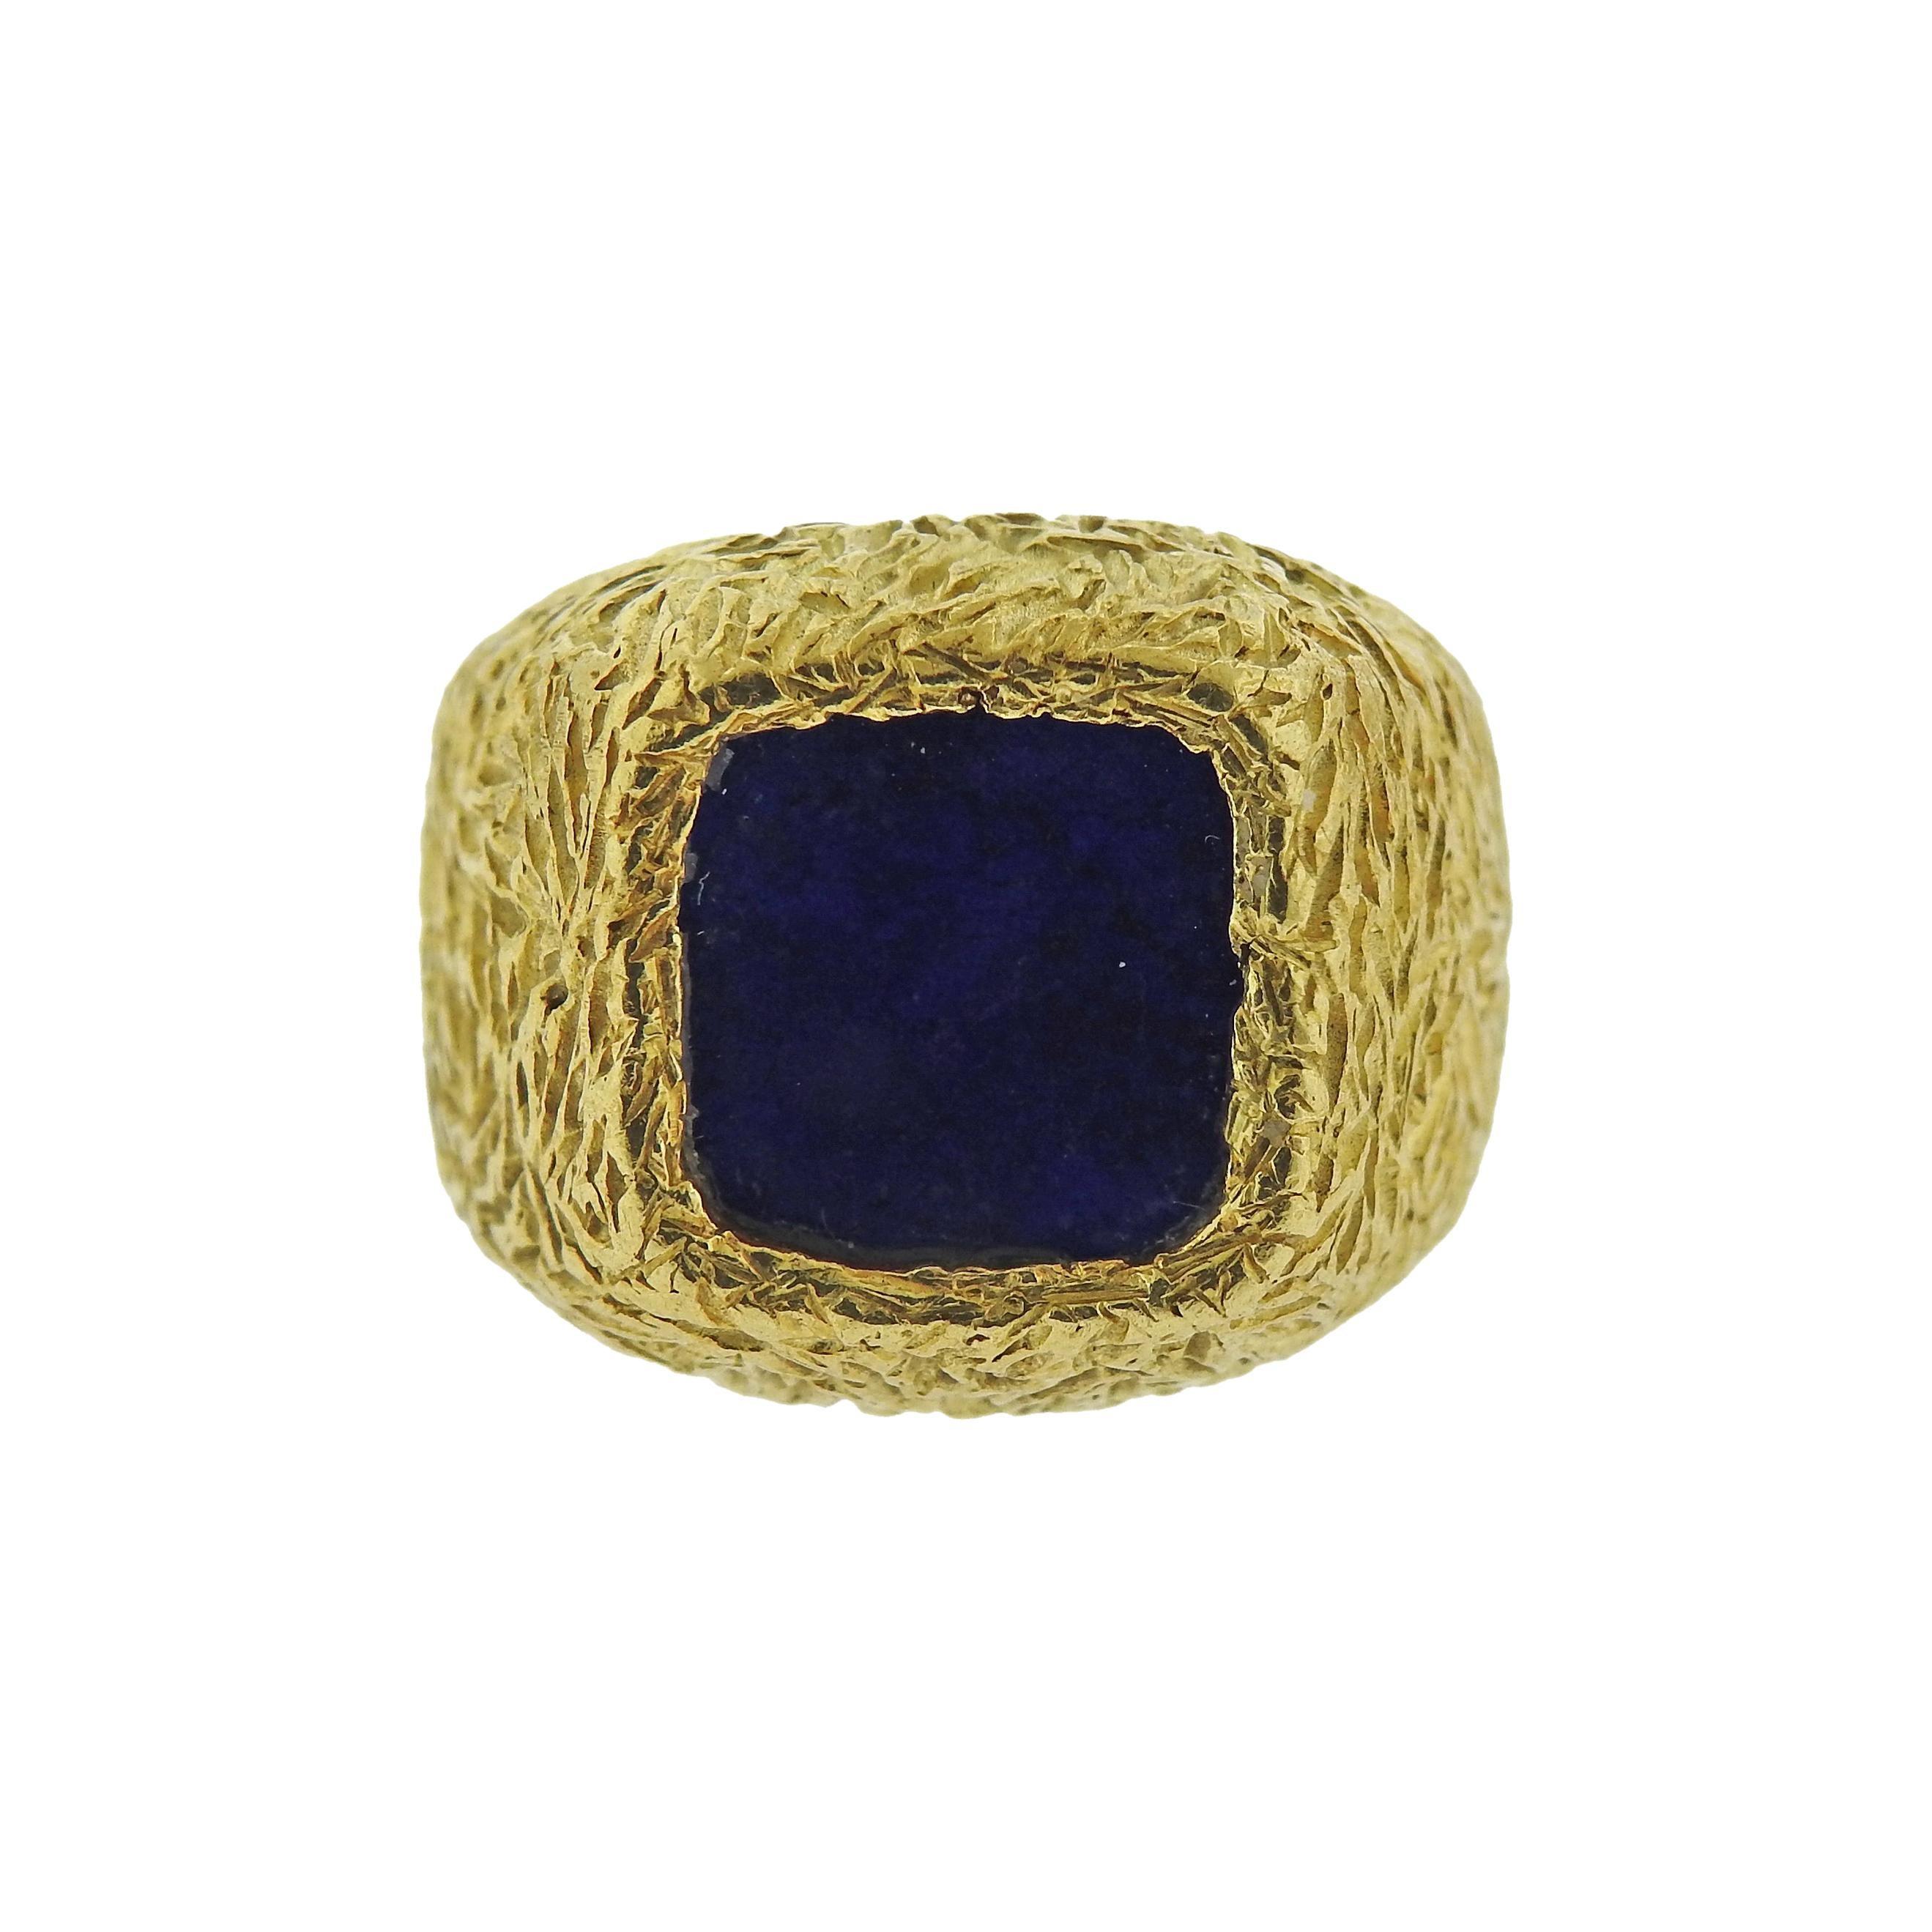 1970s Textured Gold Lapis Lazuli Ring